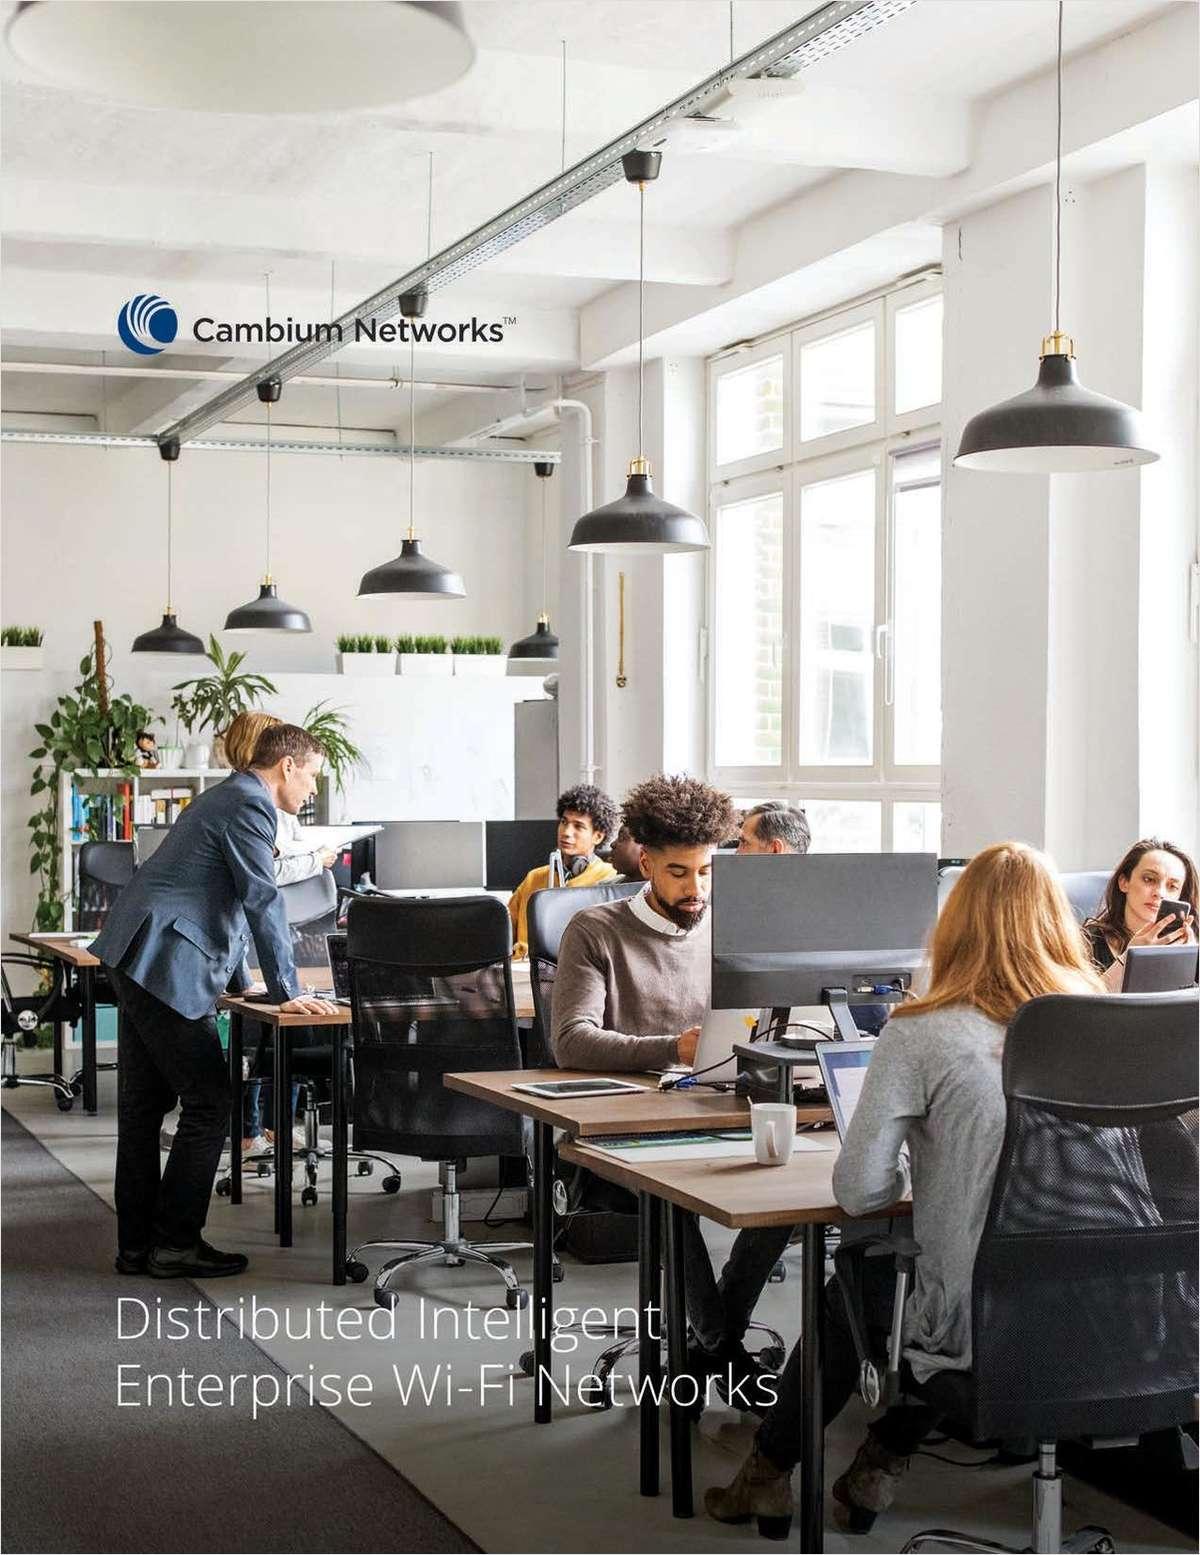 Distributed Intelligent Enterprise Wi-Fi Networks